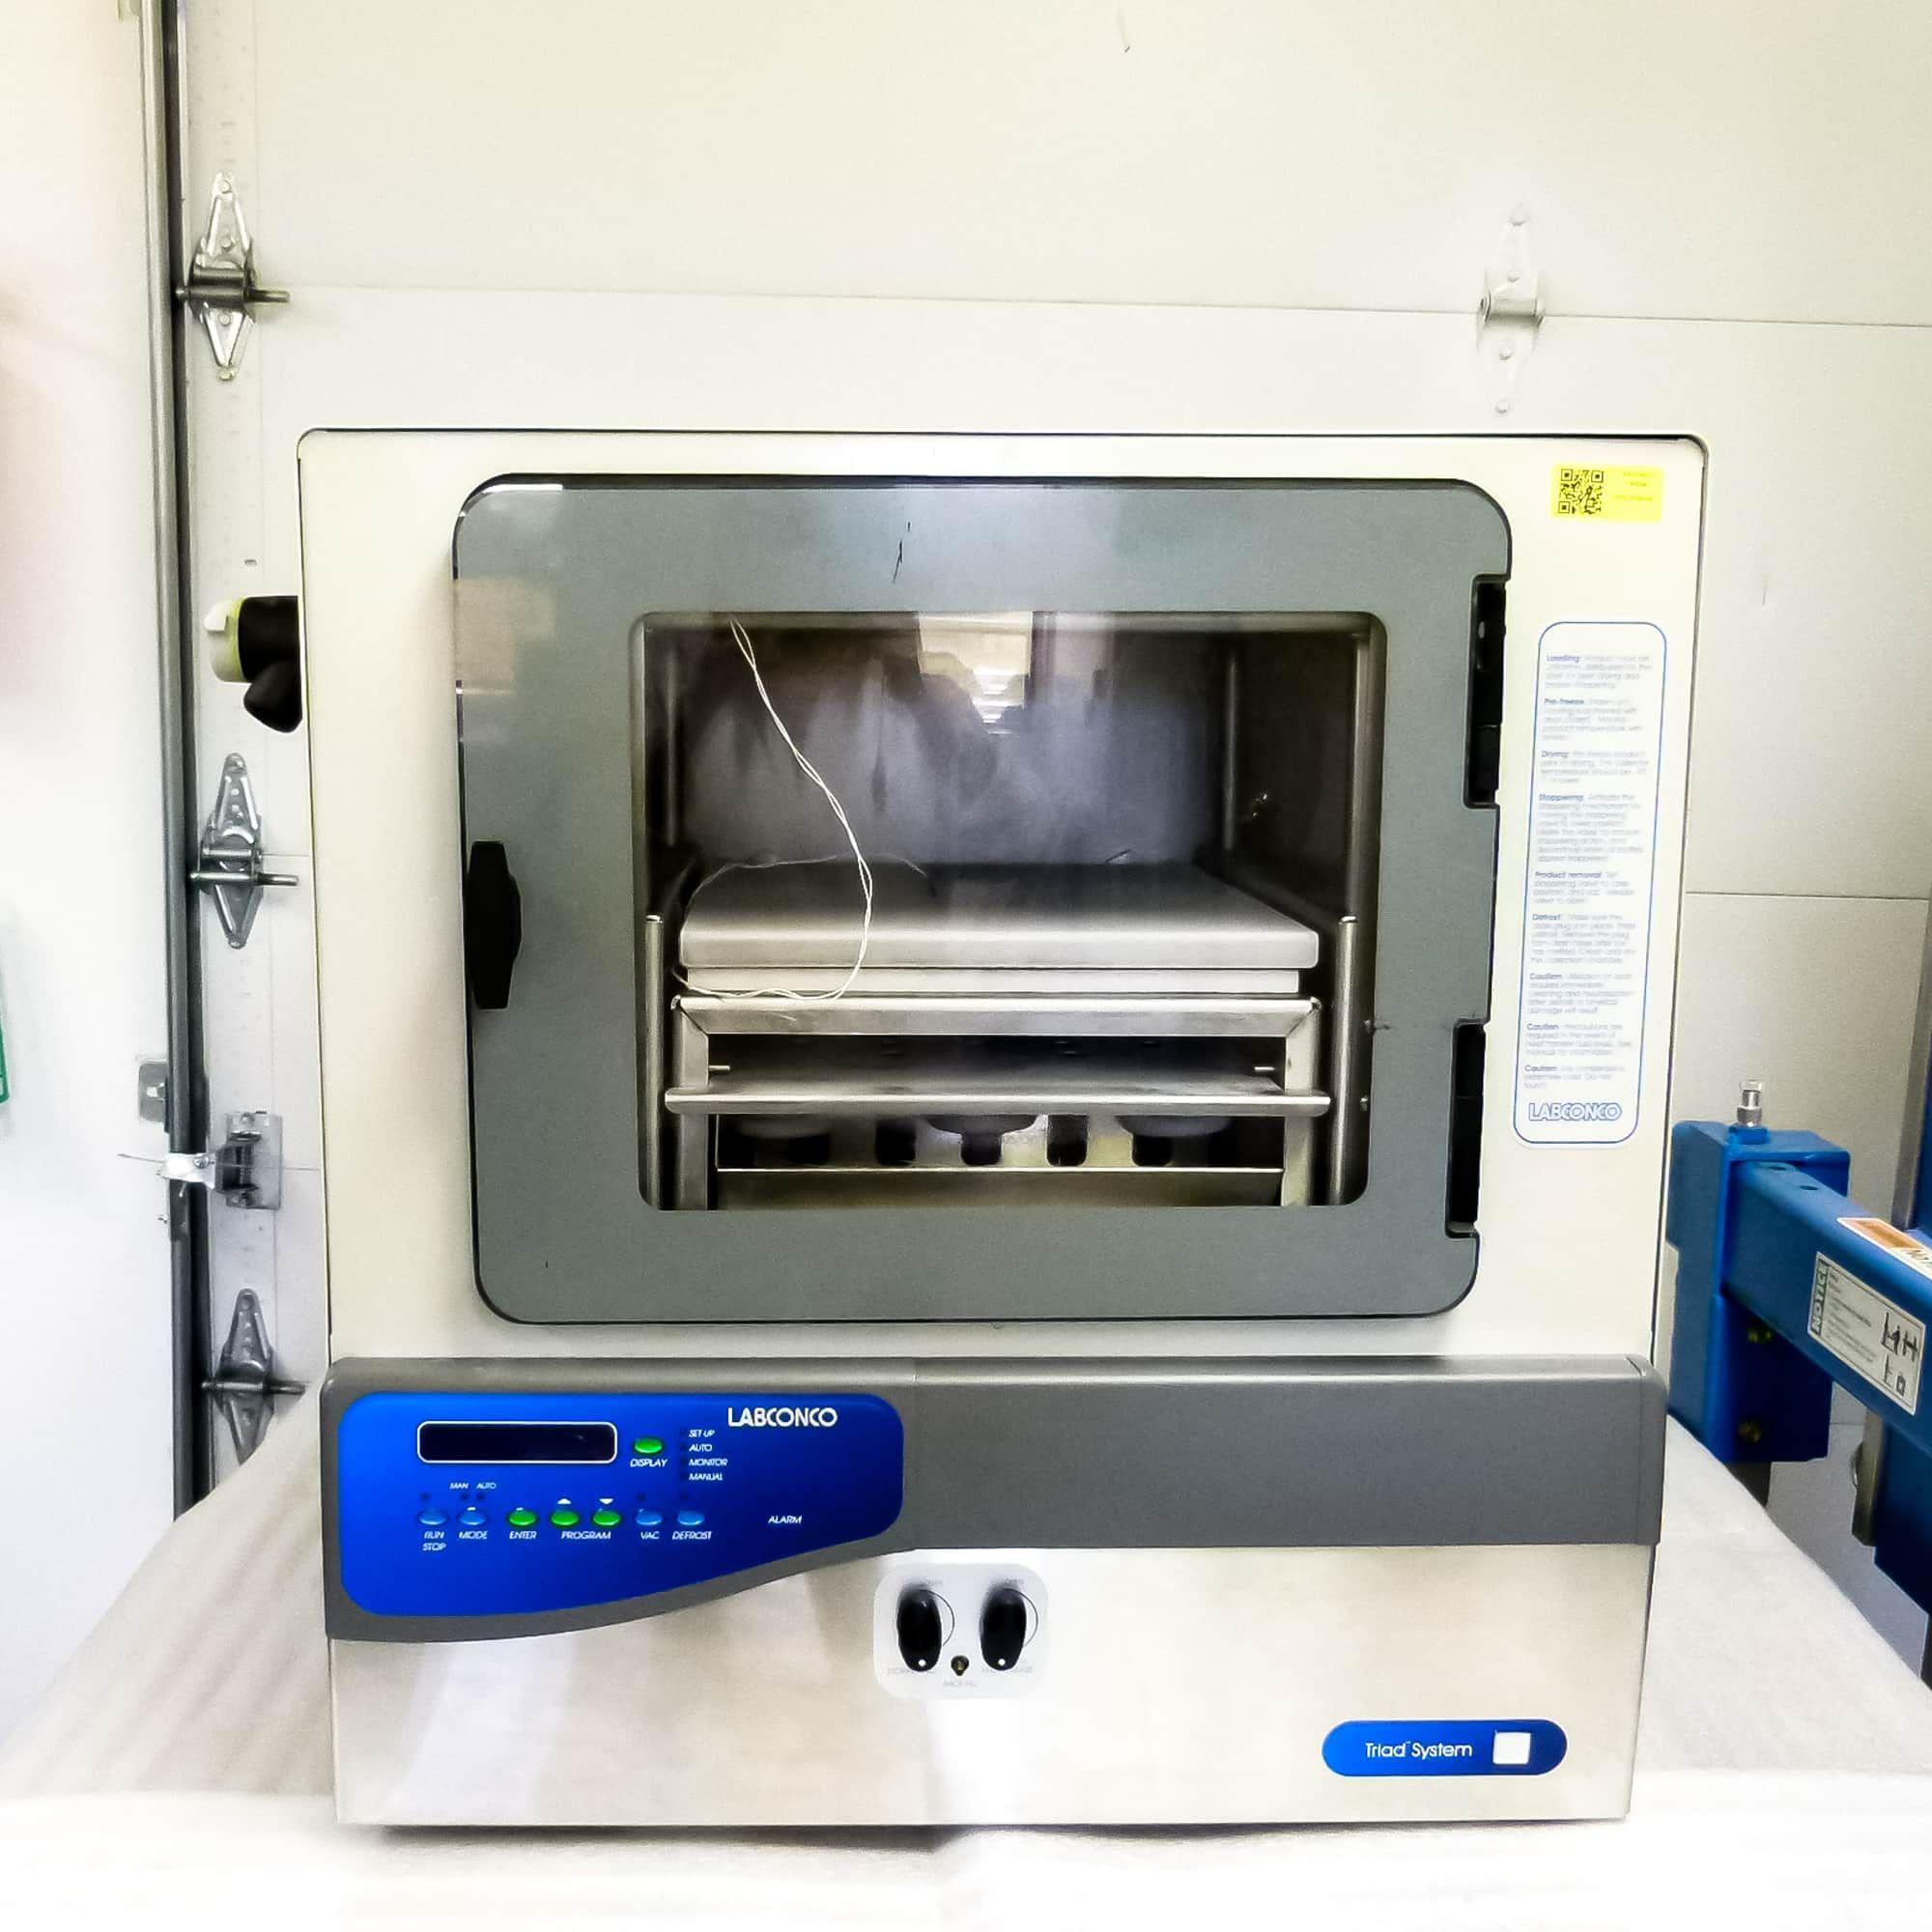 Labconco Triad Freezone Tray Lyophilizer with Stoppering Capability